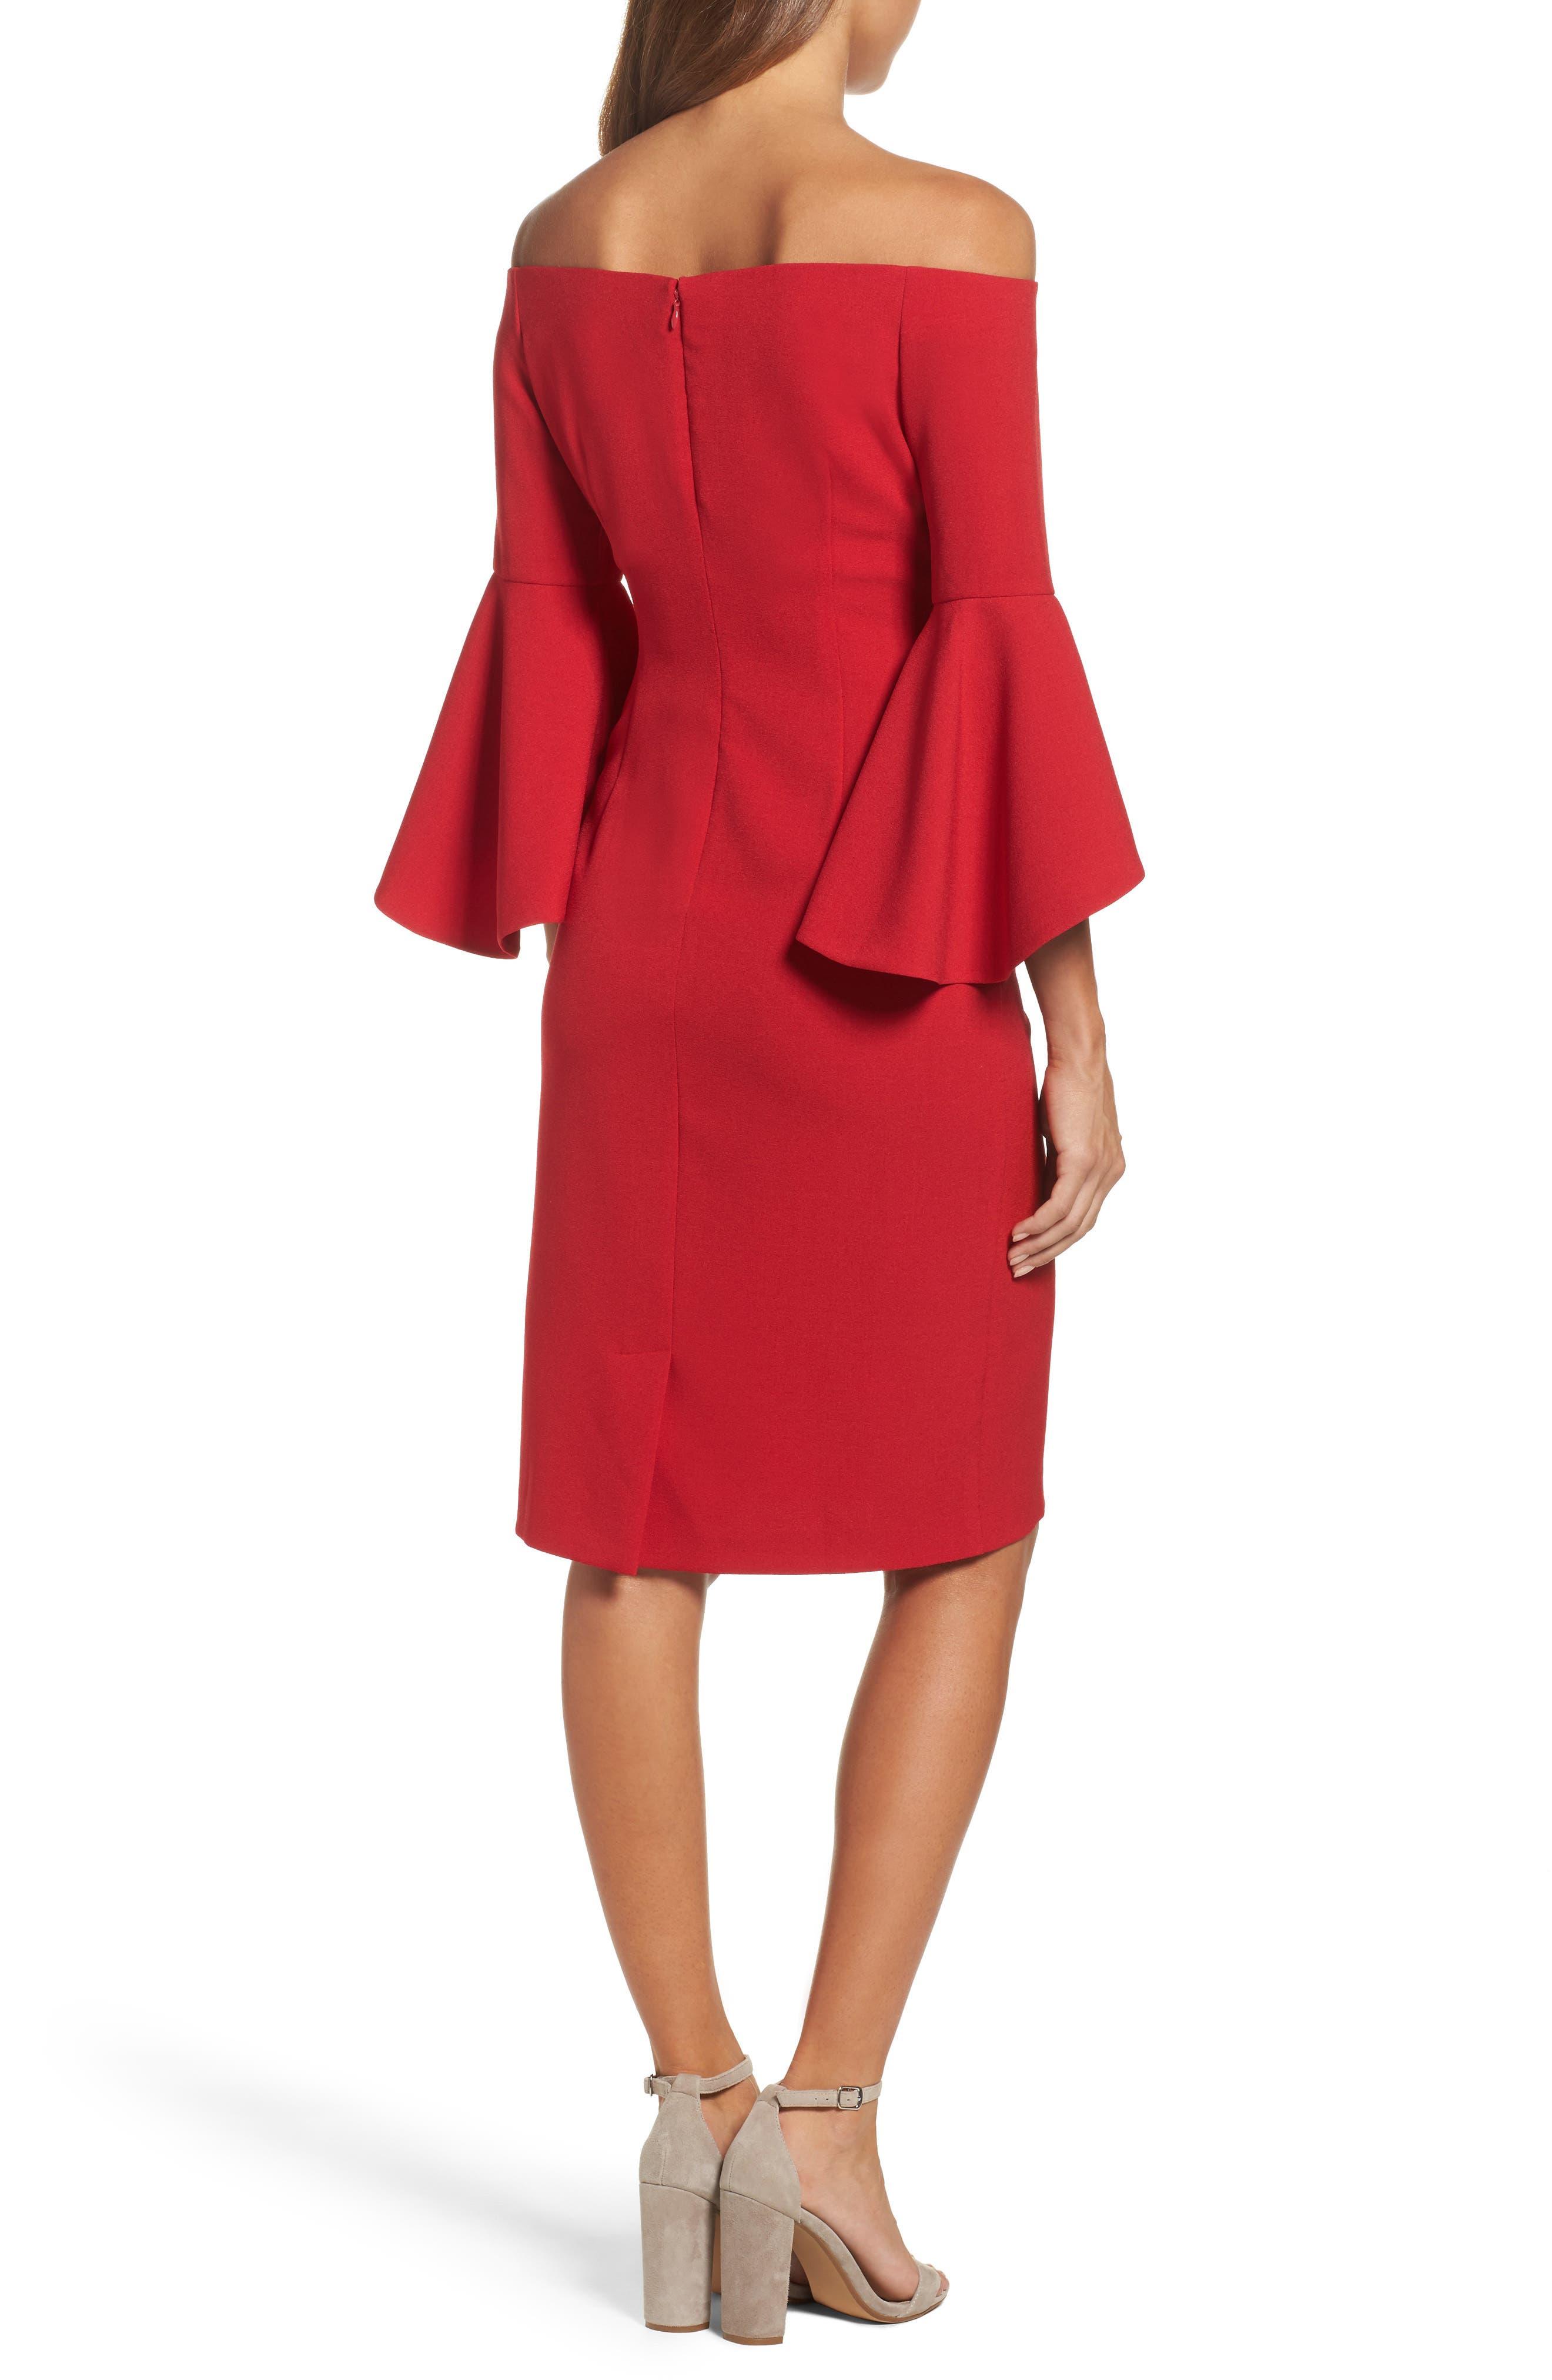 Off the Shoulder Dress,                             Alternate thumbnail 2, color,                             RED JESTER